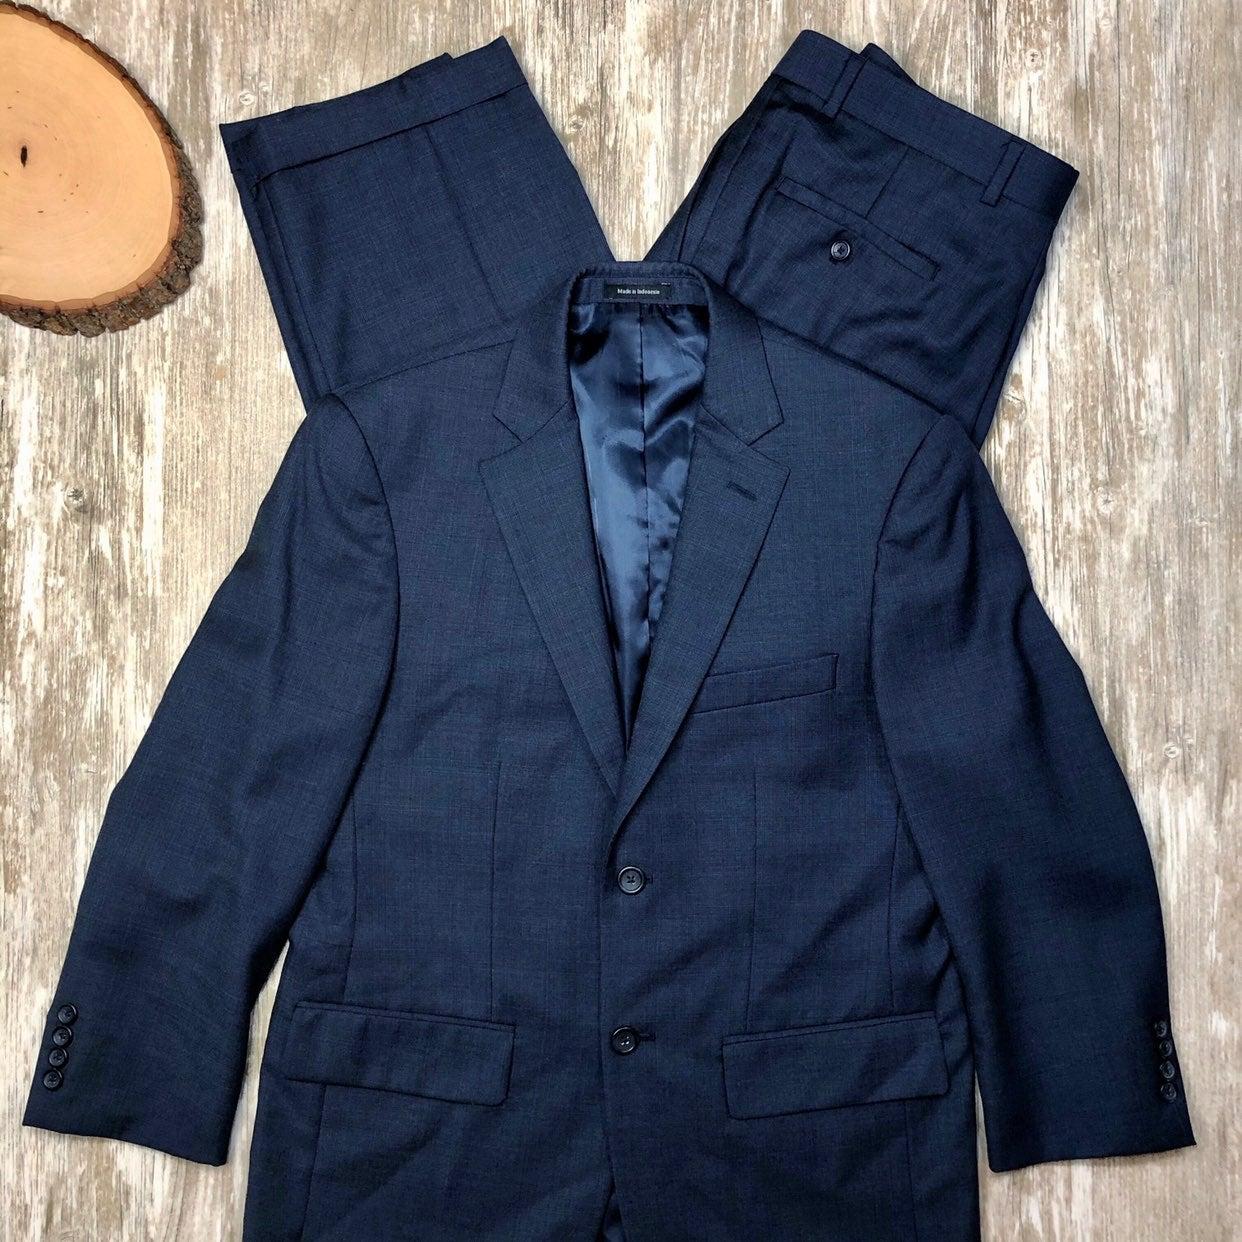 EUC Joseph & Feiss Navy Plaid Wool Suit